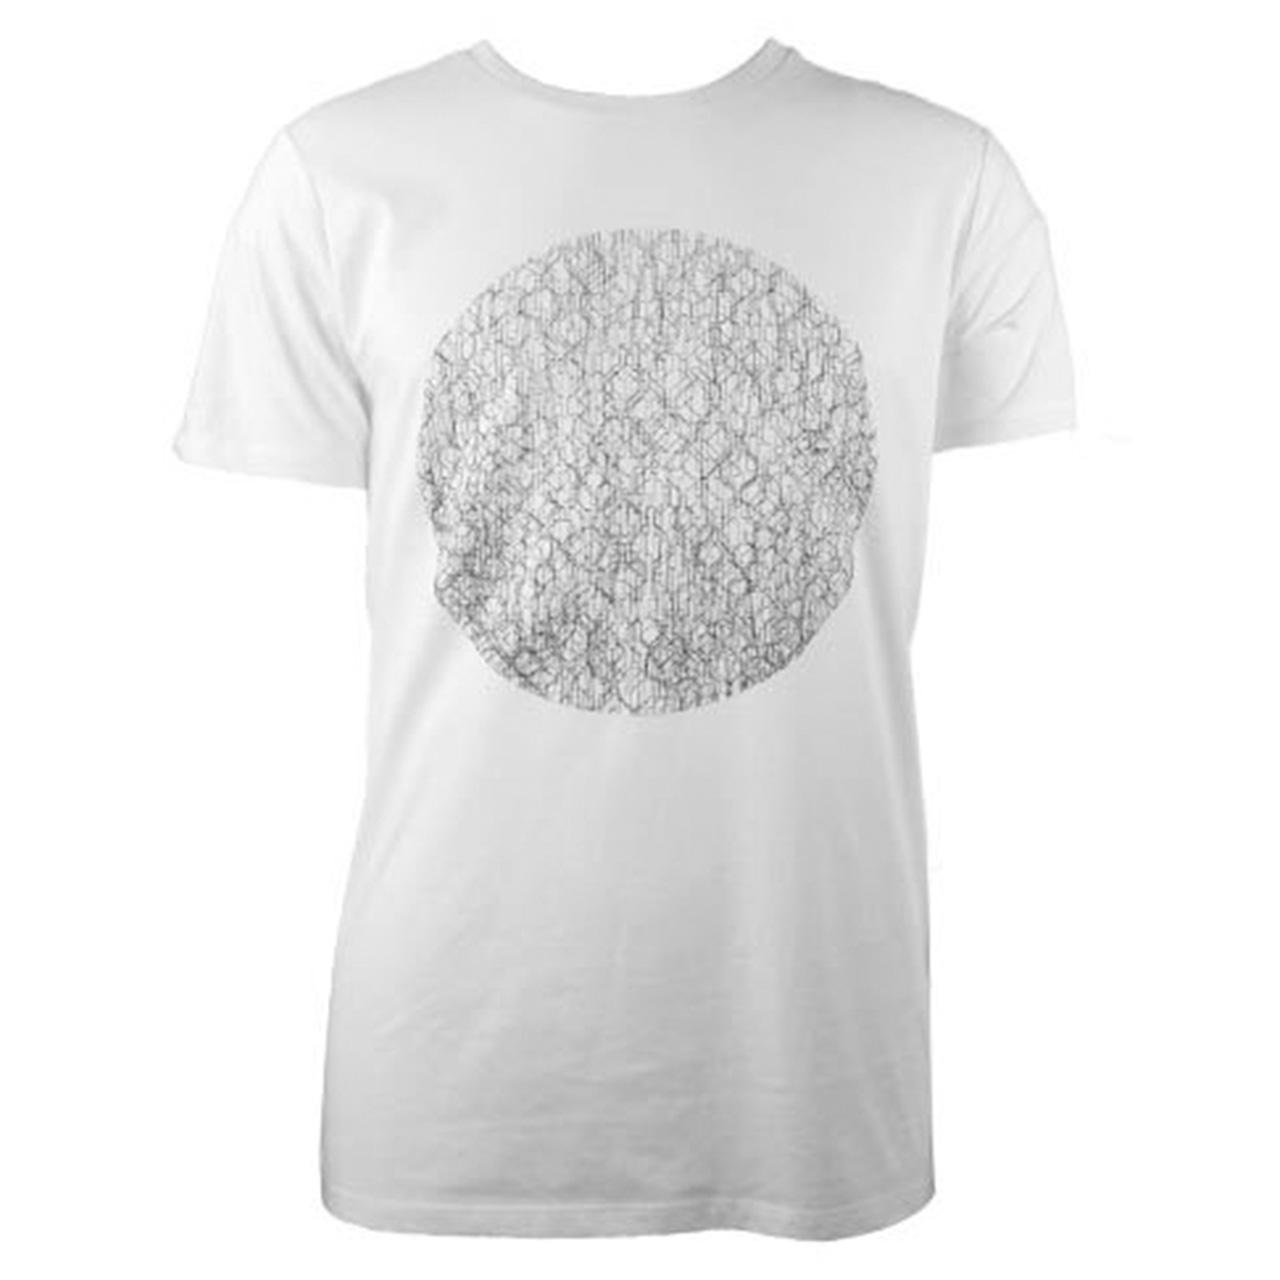 T-Shirt Fernsehturm Kreis This City Rocks men weiß/schwarz